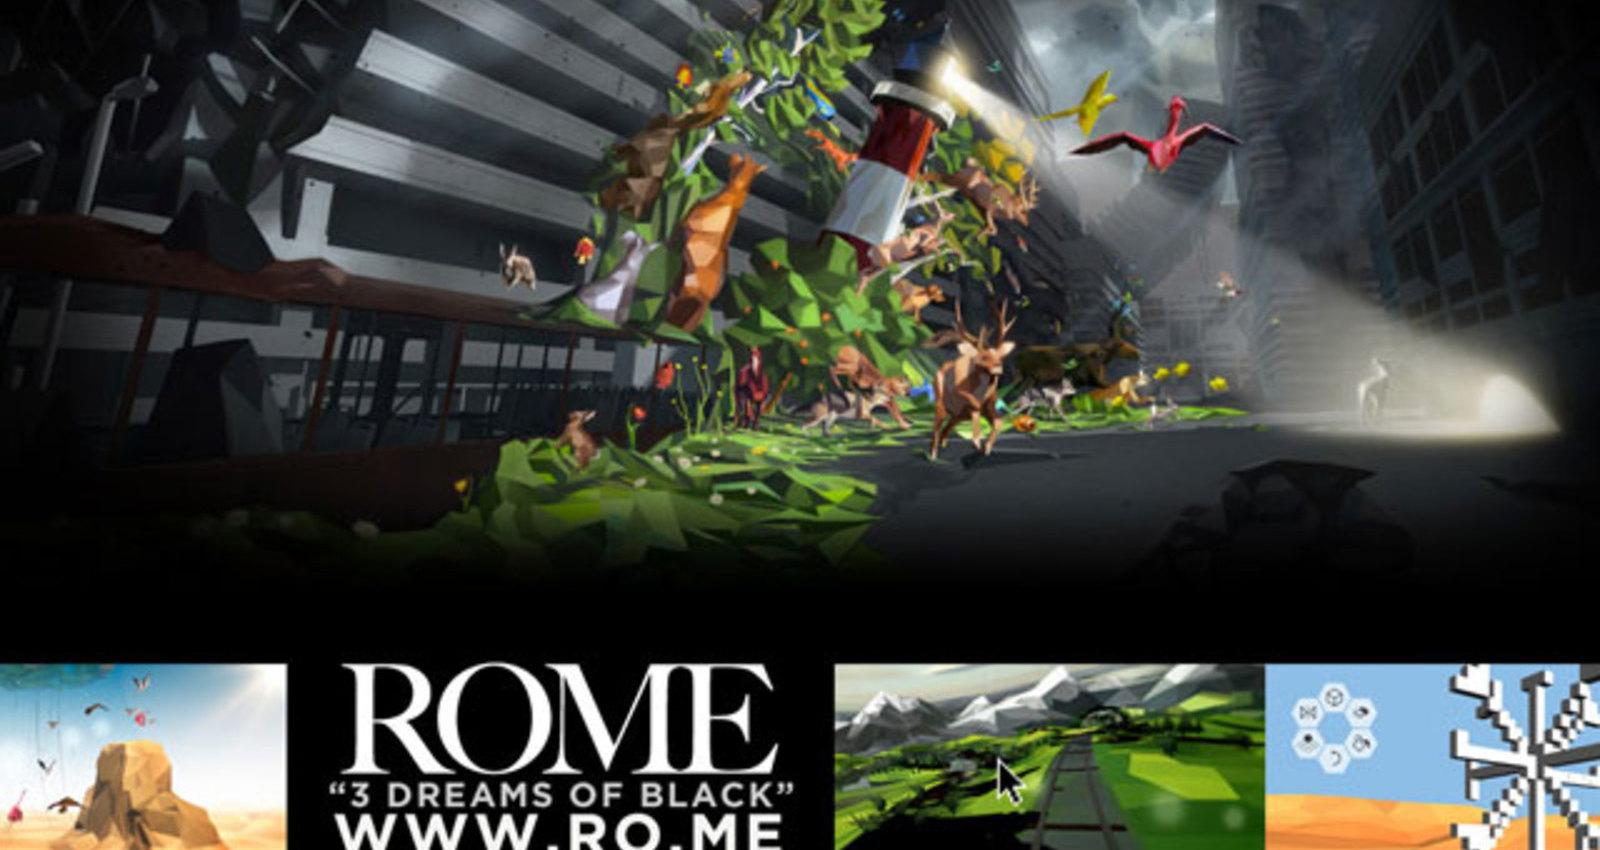 ROME - 3 Dreams of Black